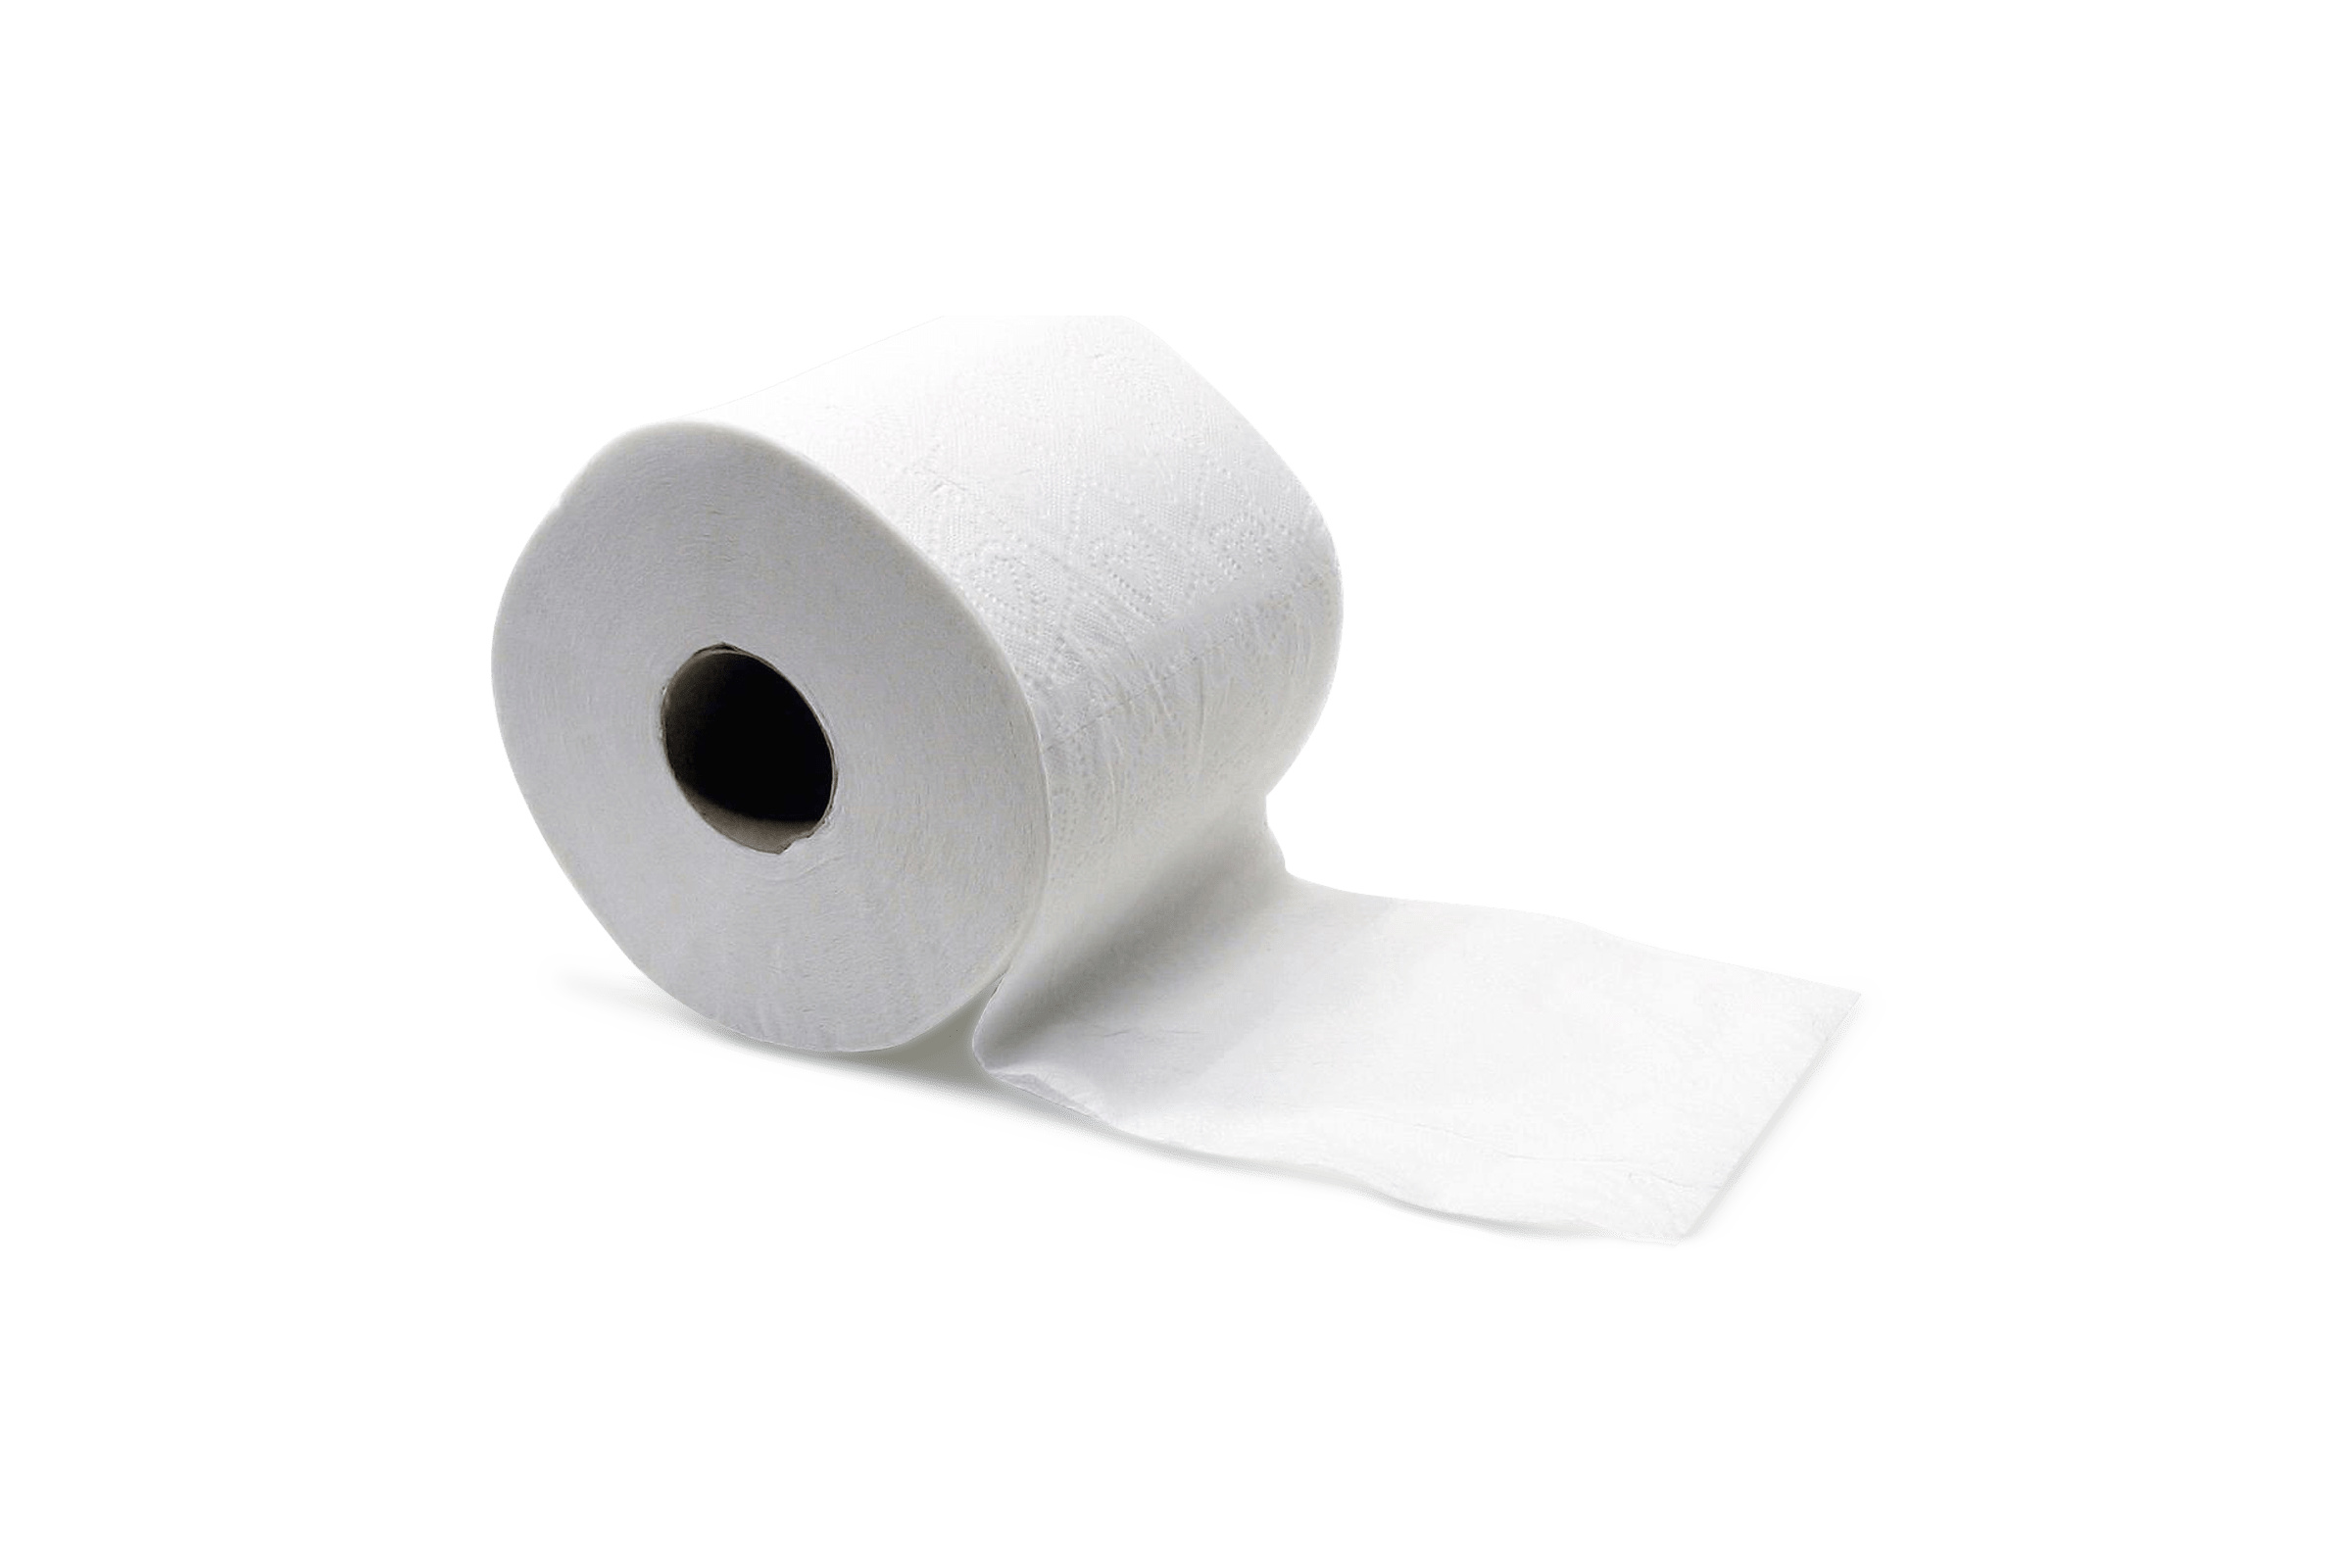 Toilettenpapier (Rolle) 1